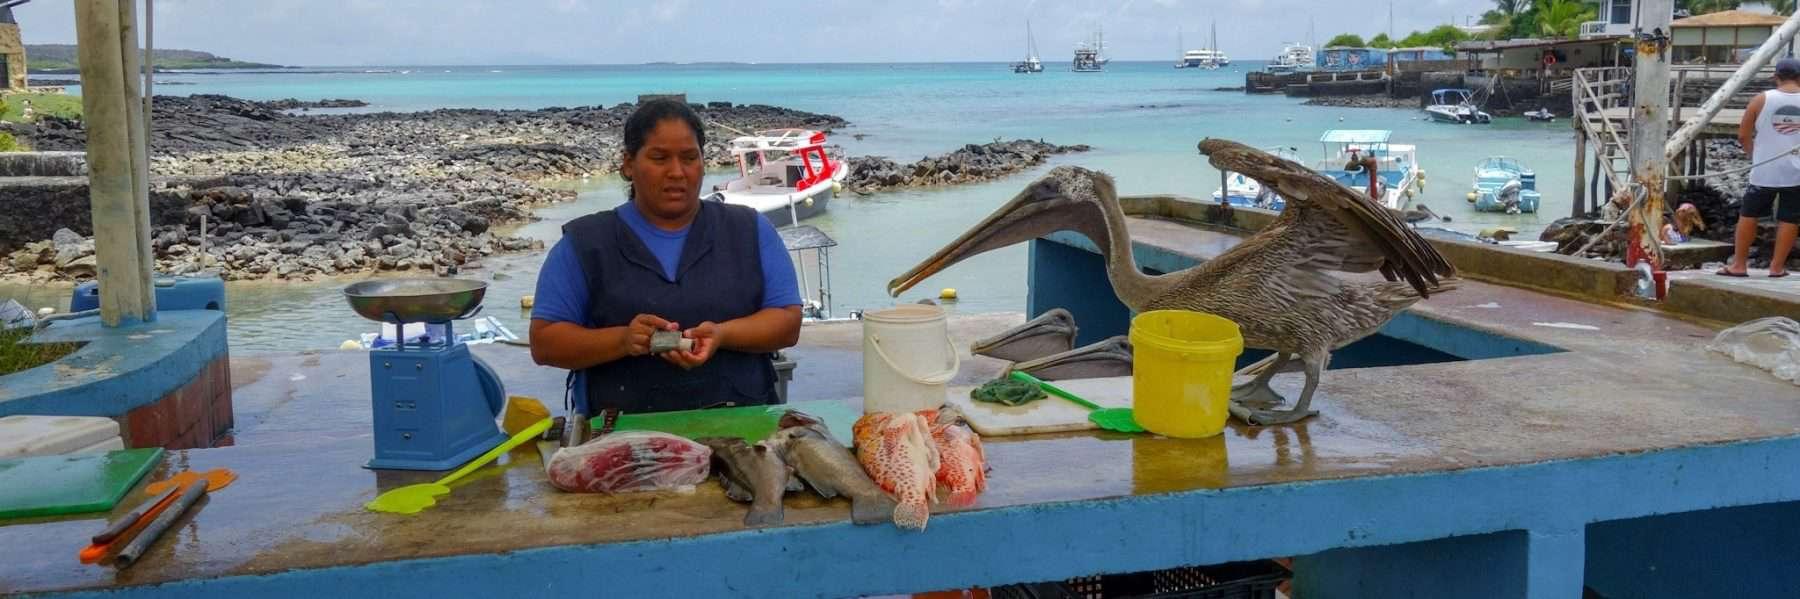 Pelicans at fish market, Puerto Ayora, Santa Cruz, Galapagos